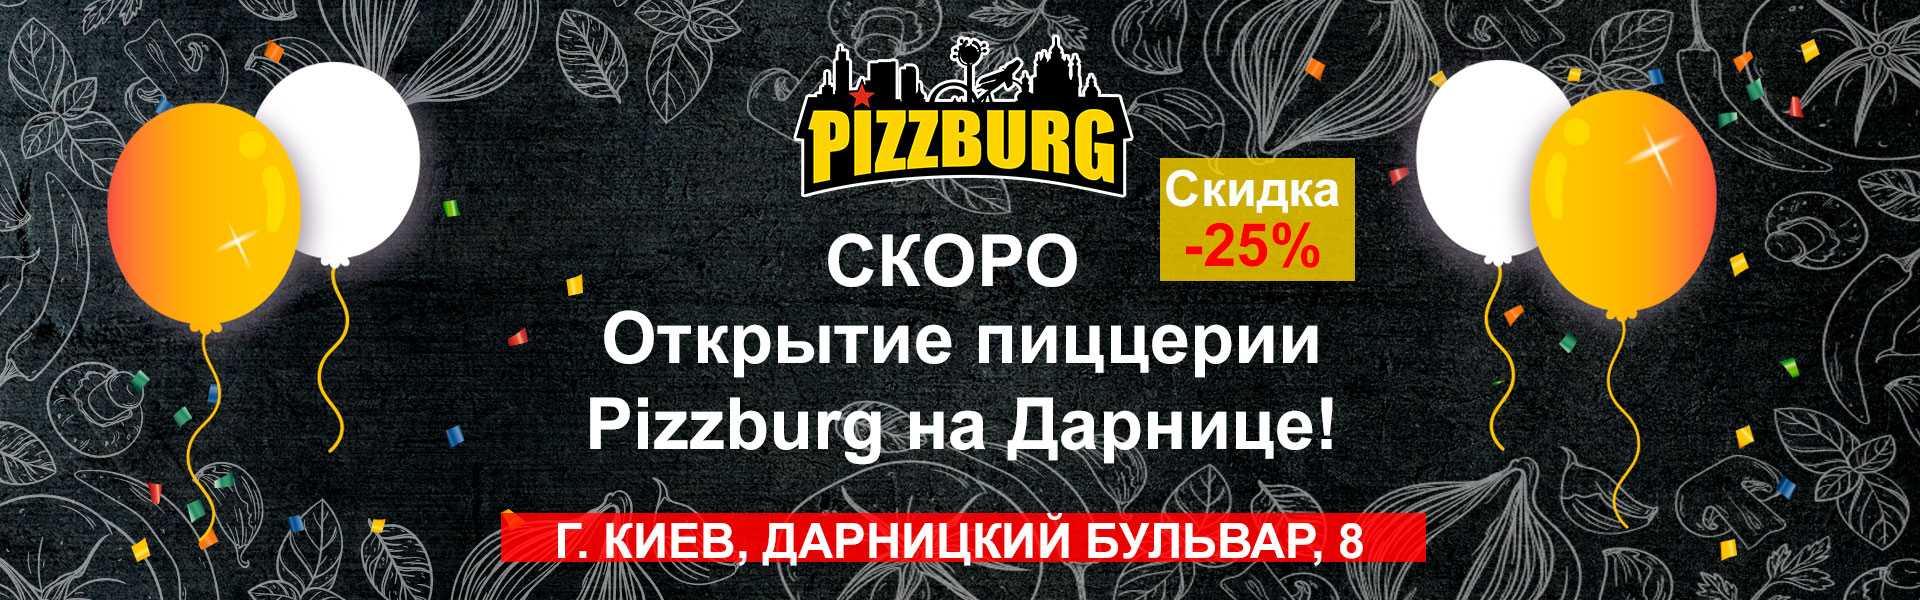 Фото - 1 декабря - открытие пиццерии PIZZBURG н - Пиццбург